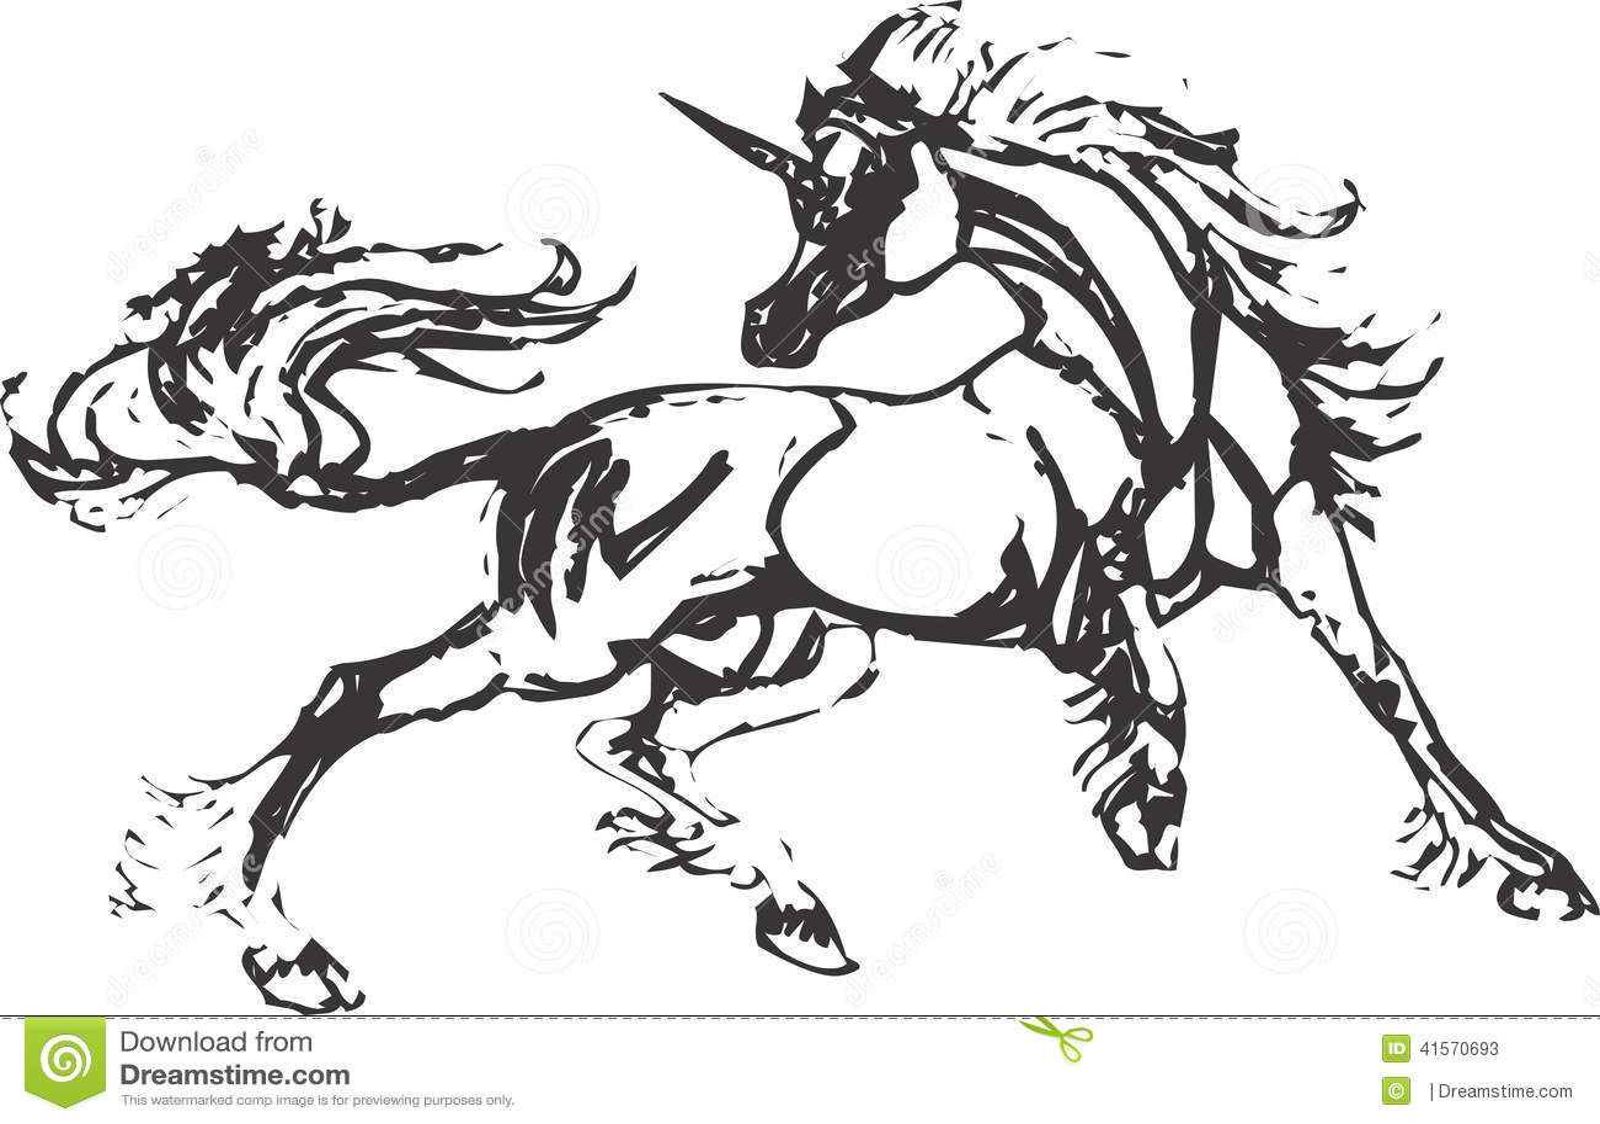 Unicorn Vector Design Clipart Stock Vector